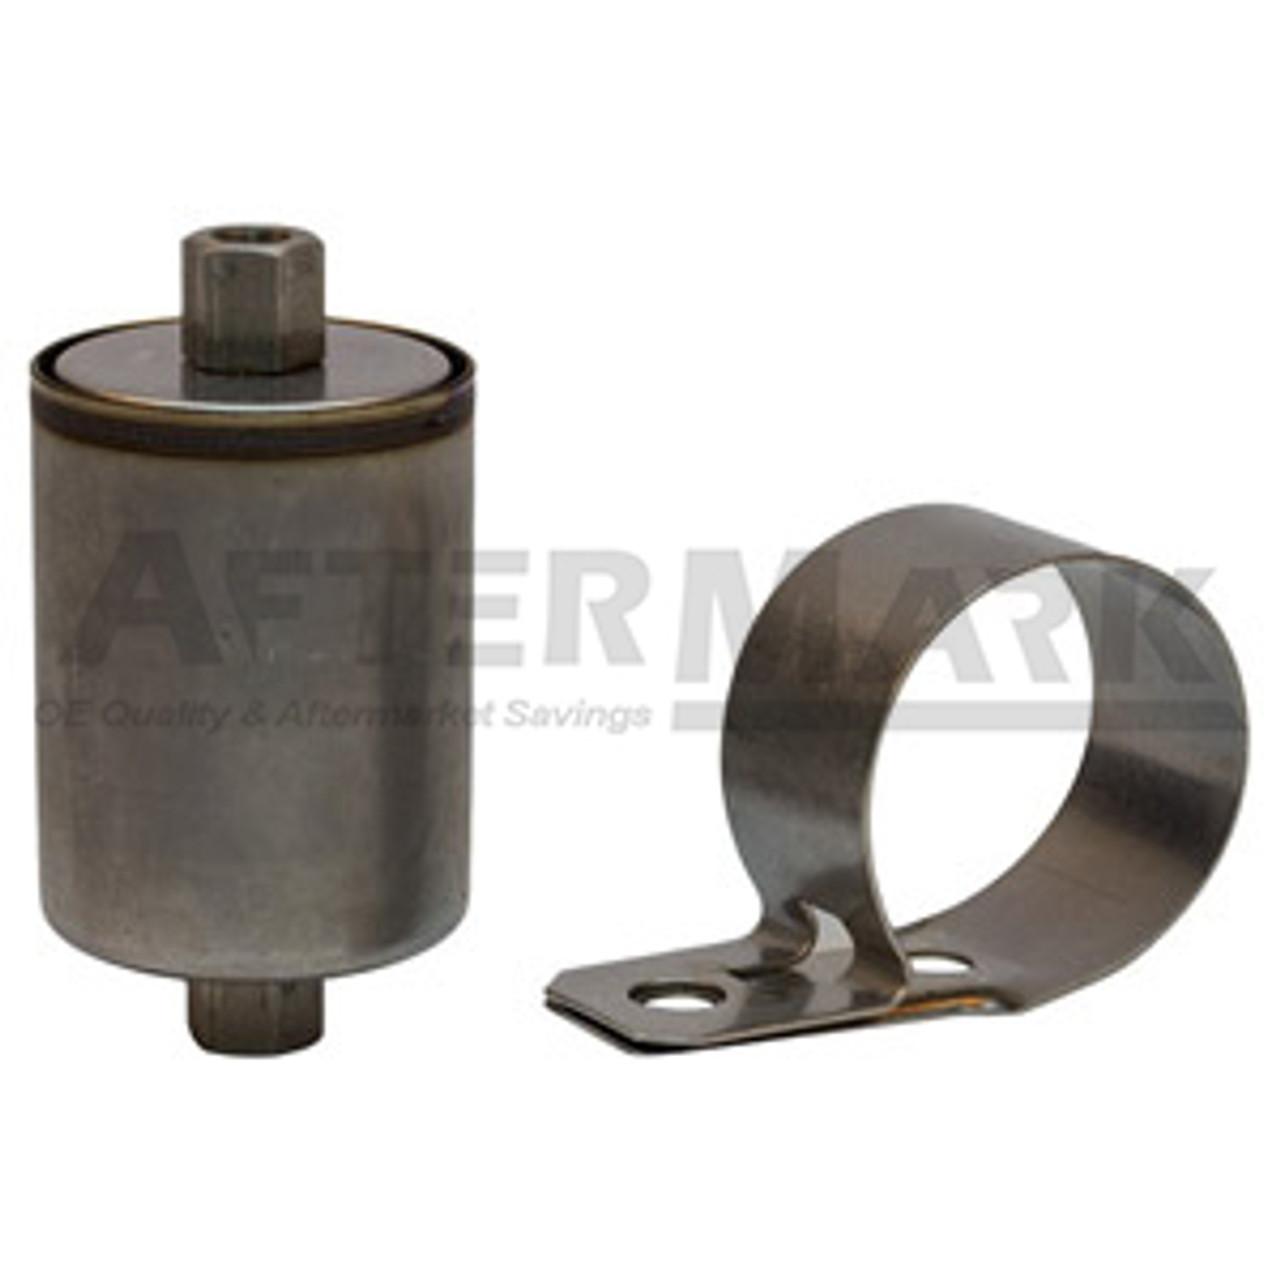 hight resolution of king fuel filter